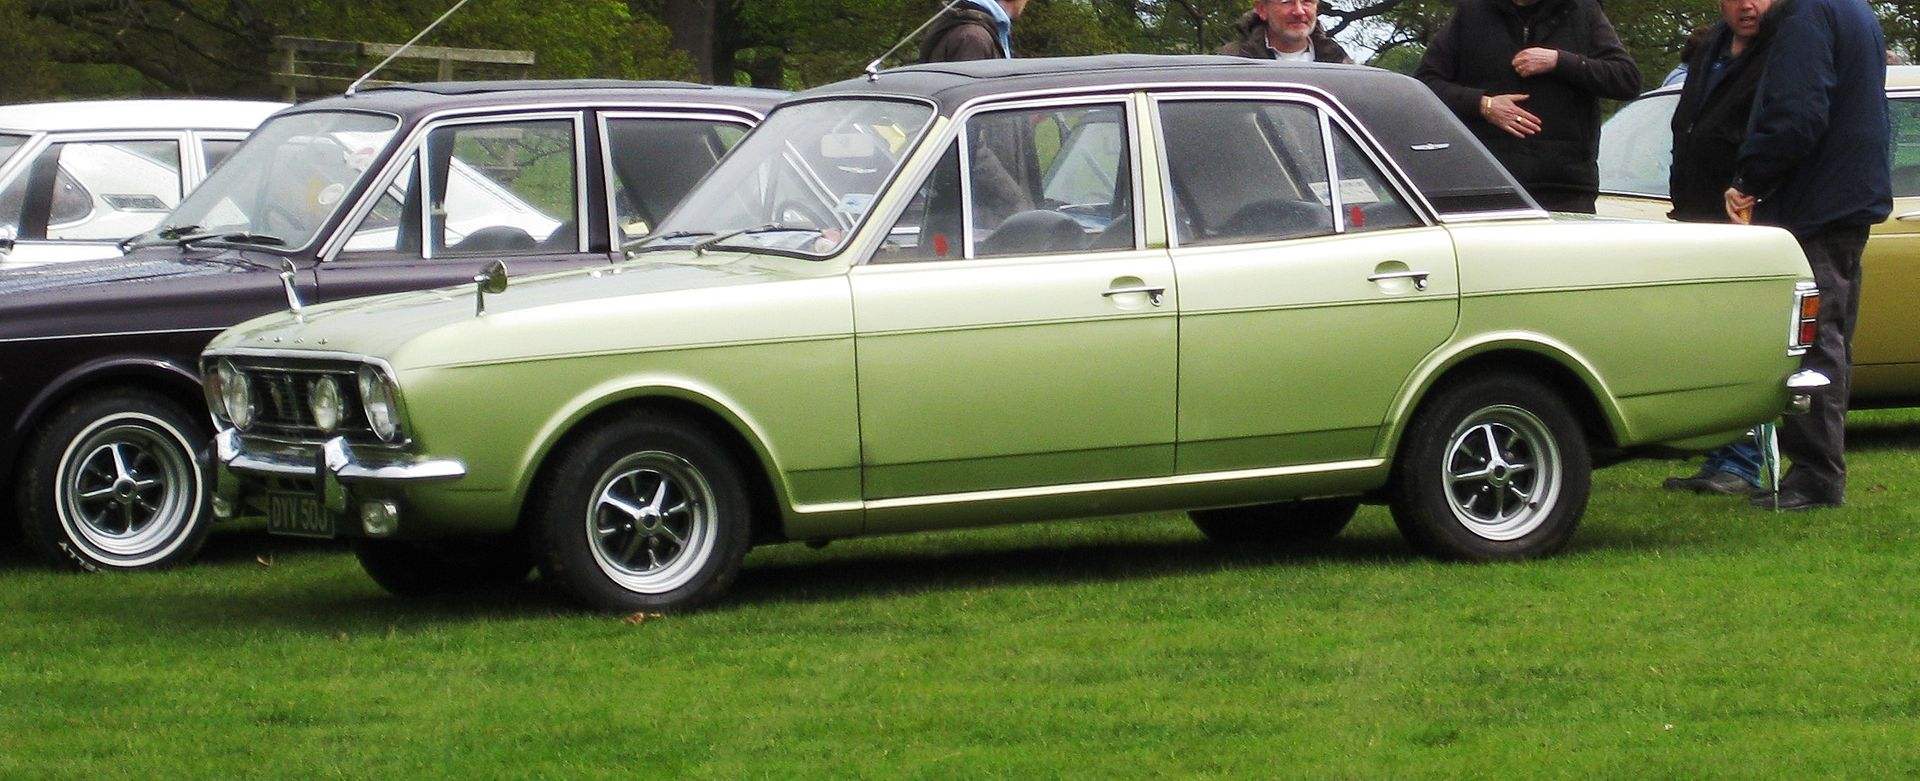 Ford Motor Company Part Ix The Cortina Myn Transport Blog Td Wiring Diagram 1970 1600e 1599cc